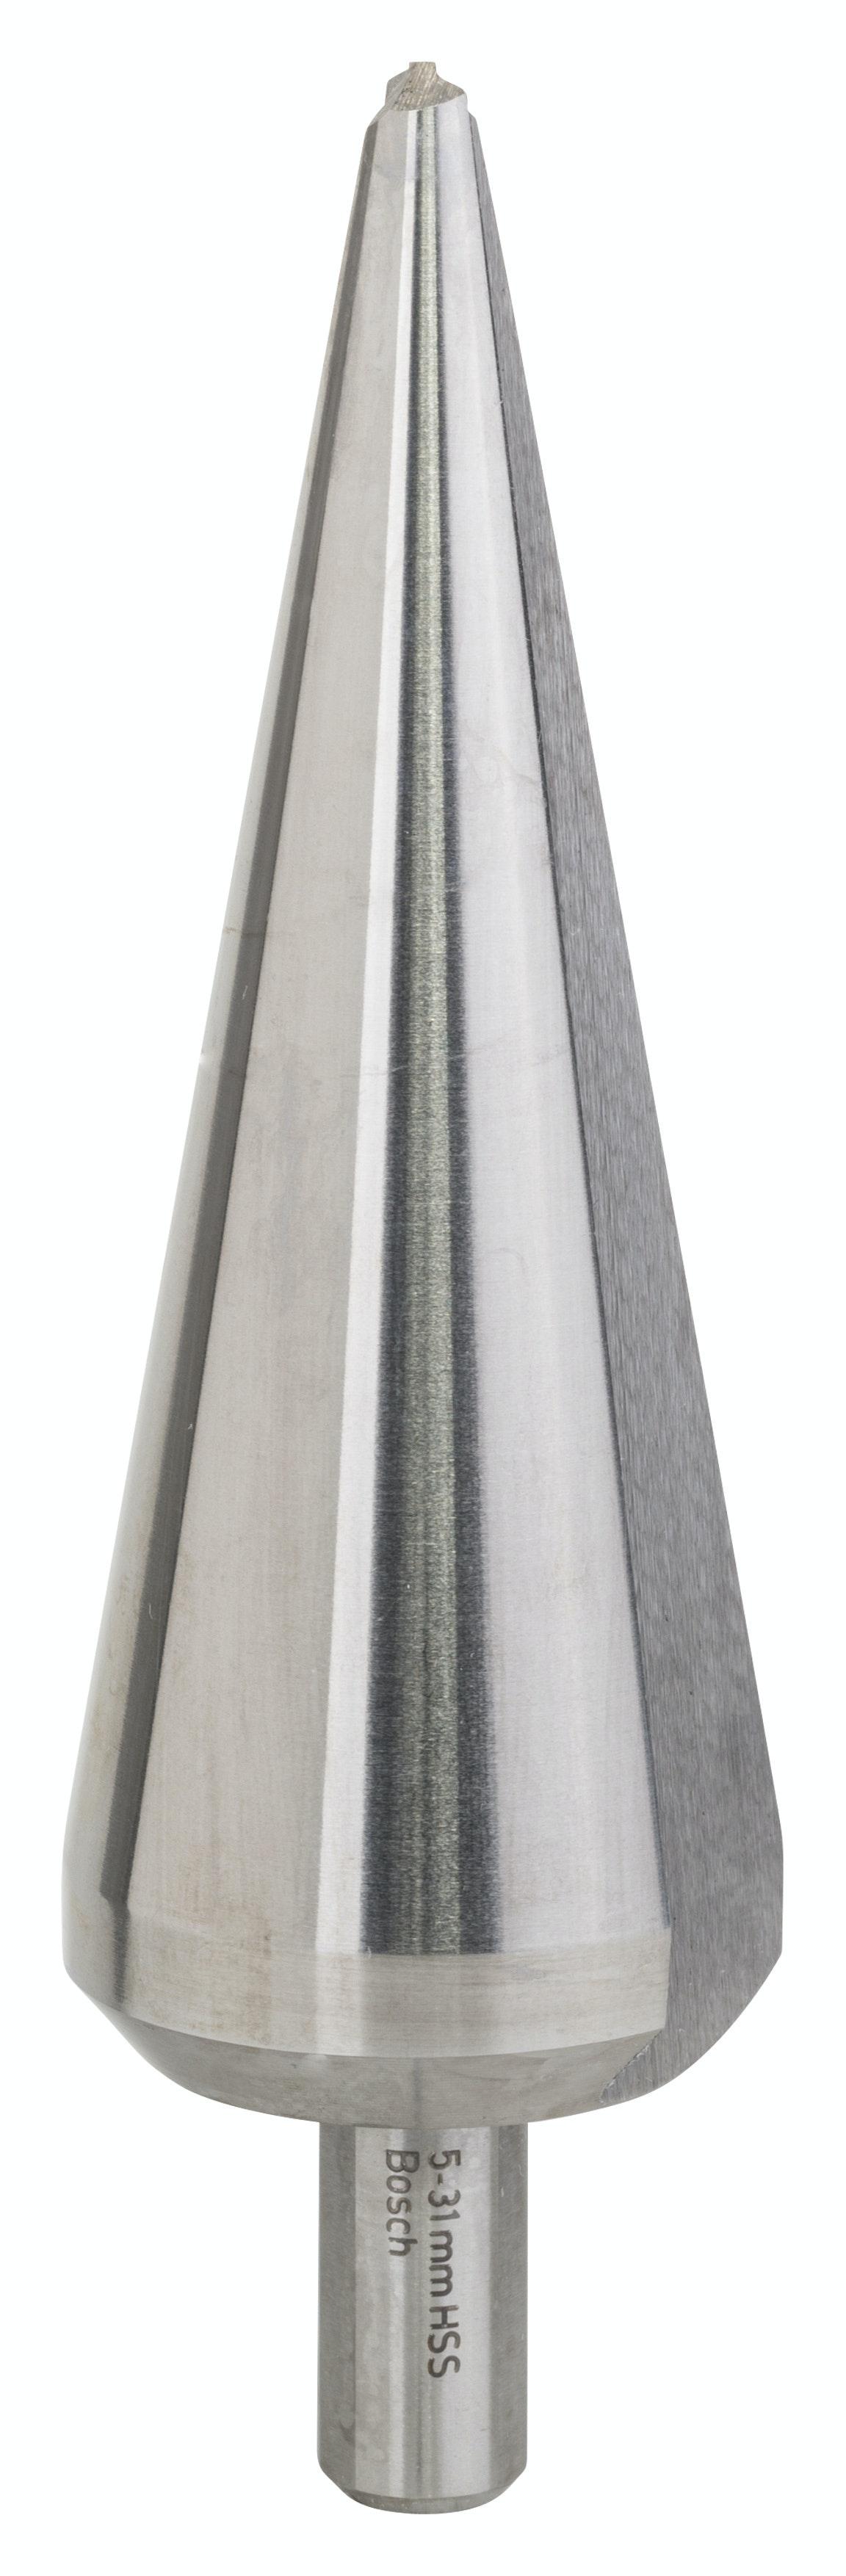 Antennfräs Bosch Cylindrisk 5-31mm